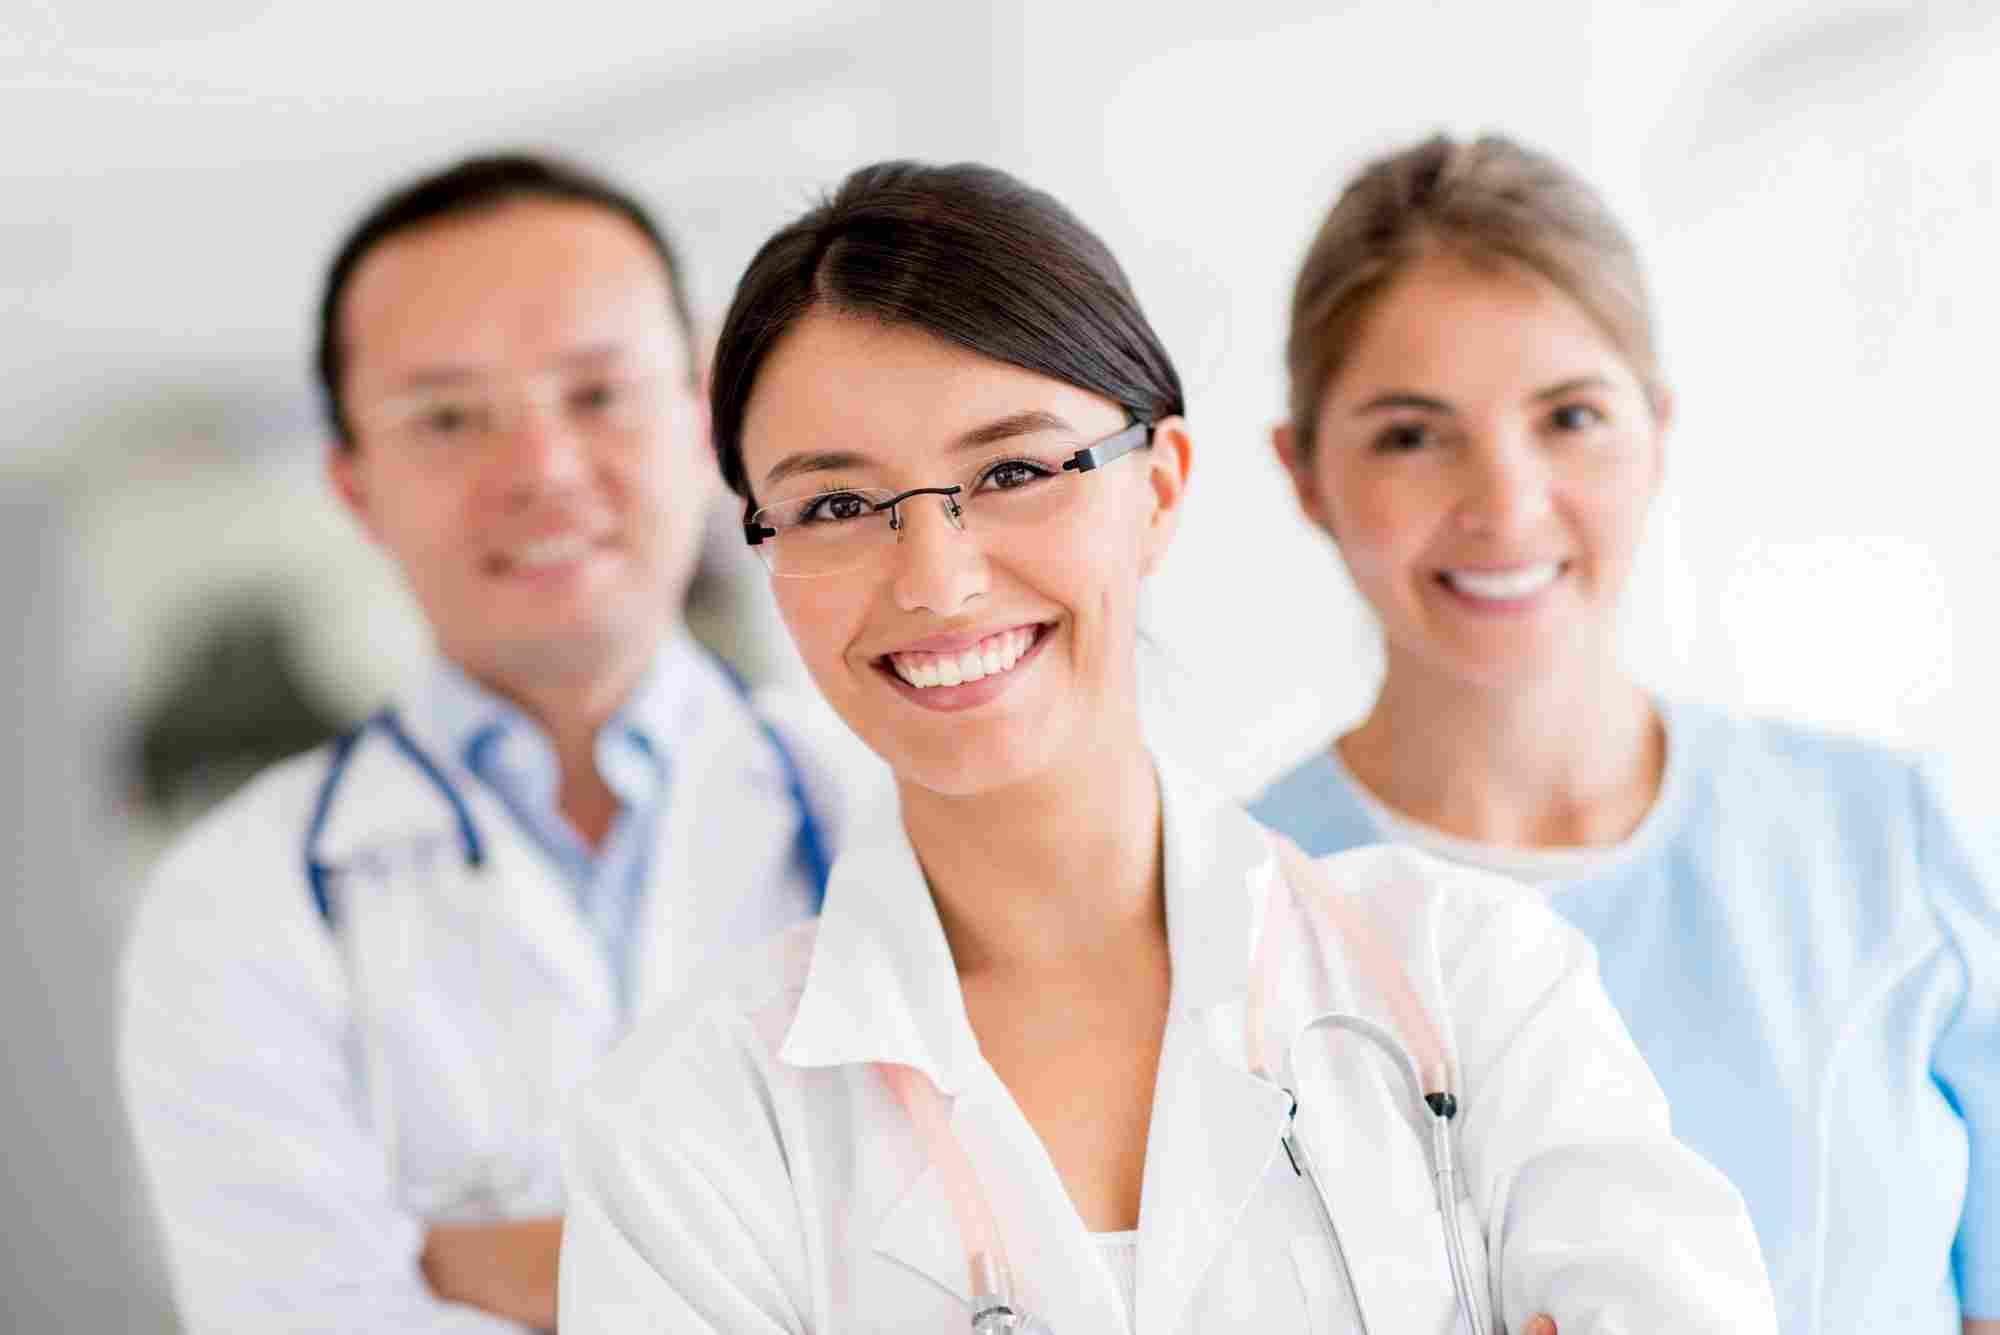 http://www.paragonanalysis.com/wp-content/uploads/2015/12/doctors.jpg